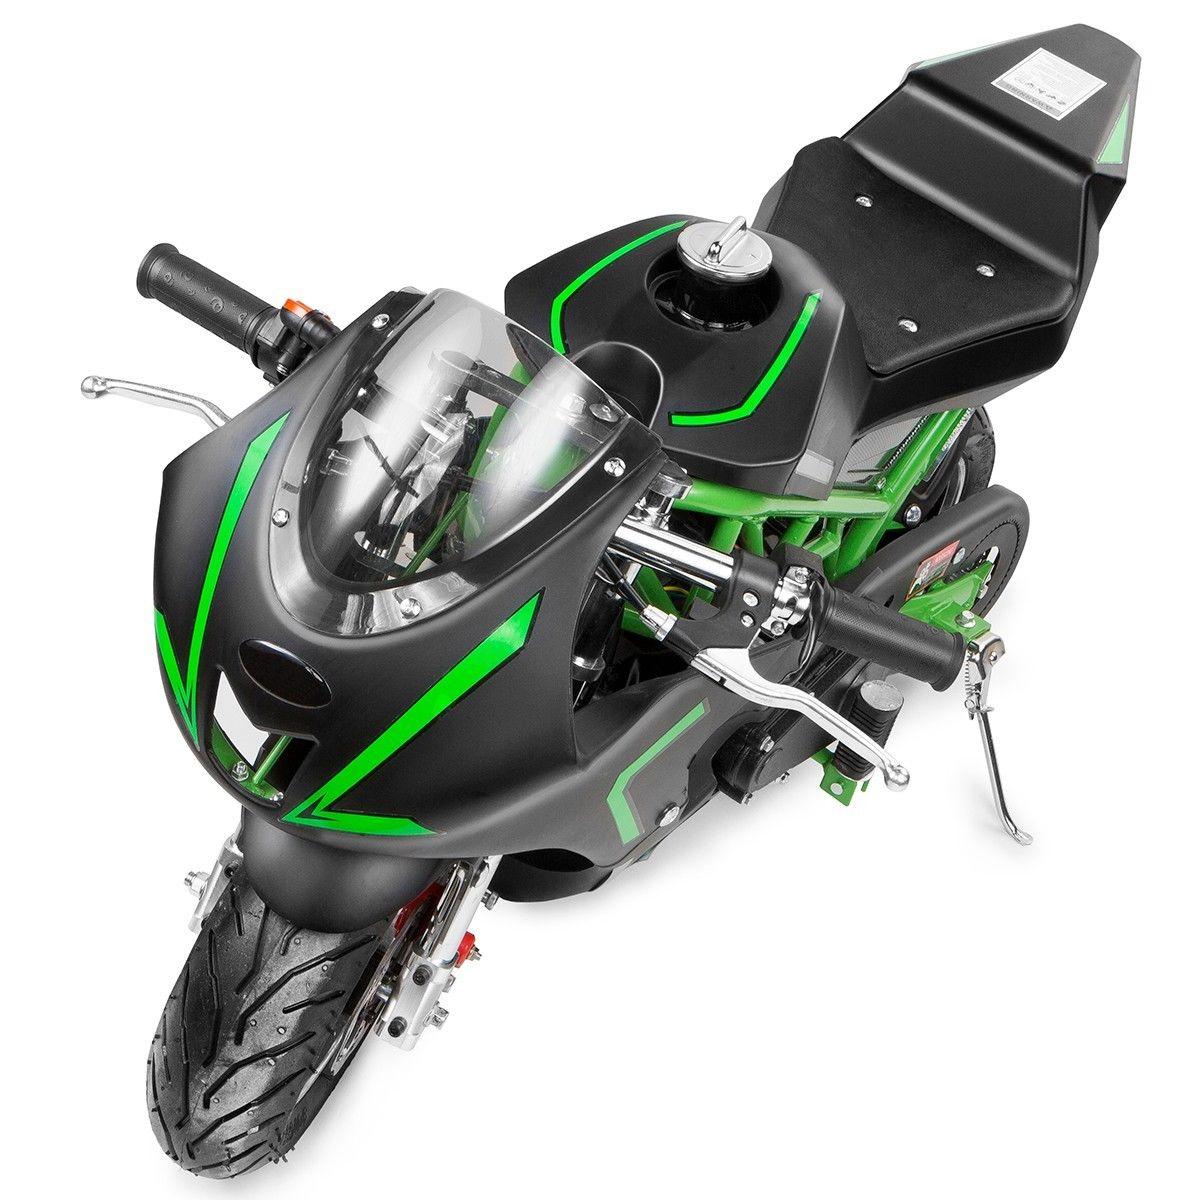 XtremepowerUS-Gas-Pocket-Bike-Motor-Bike-Scooter-40cc-Epa-Engine-Motorcycle thumbnail 15